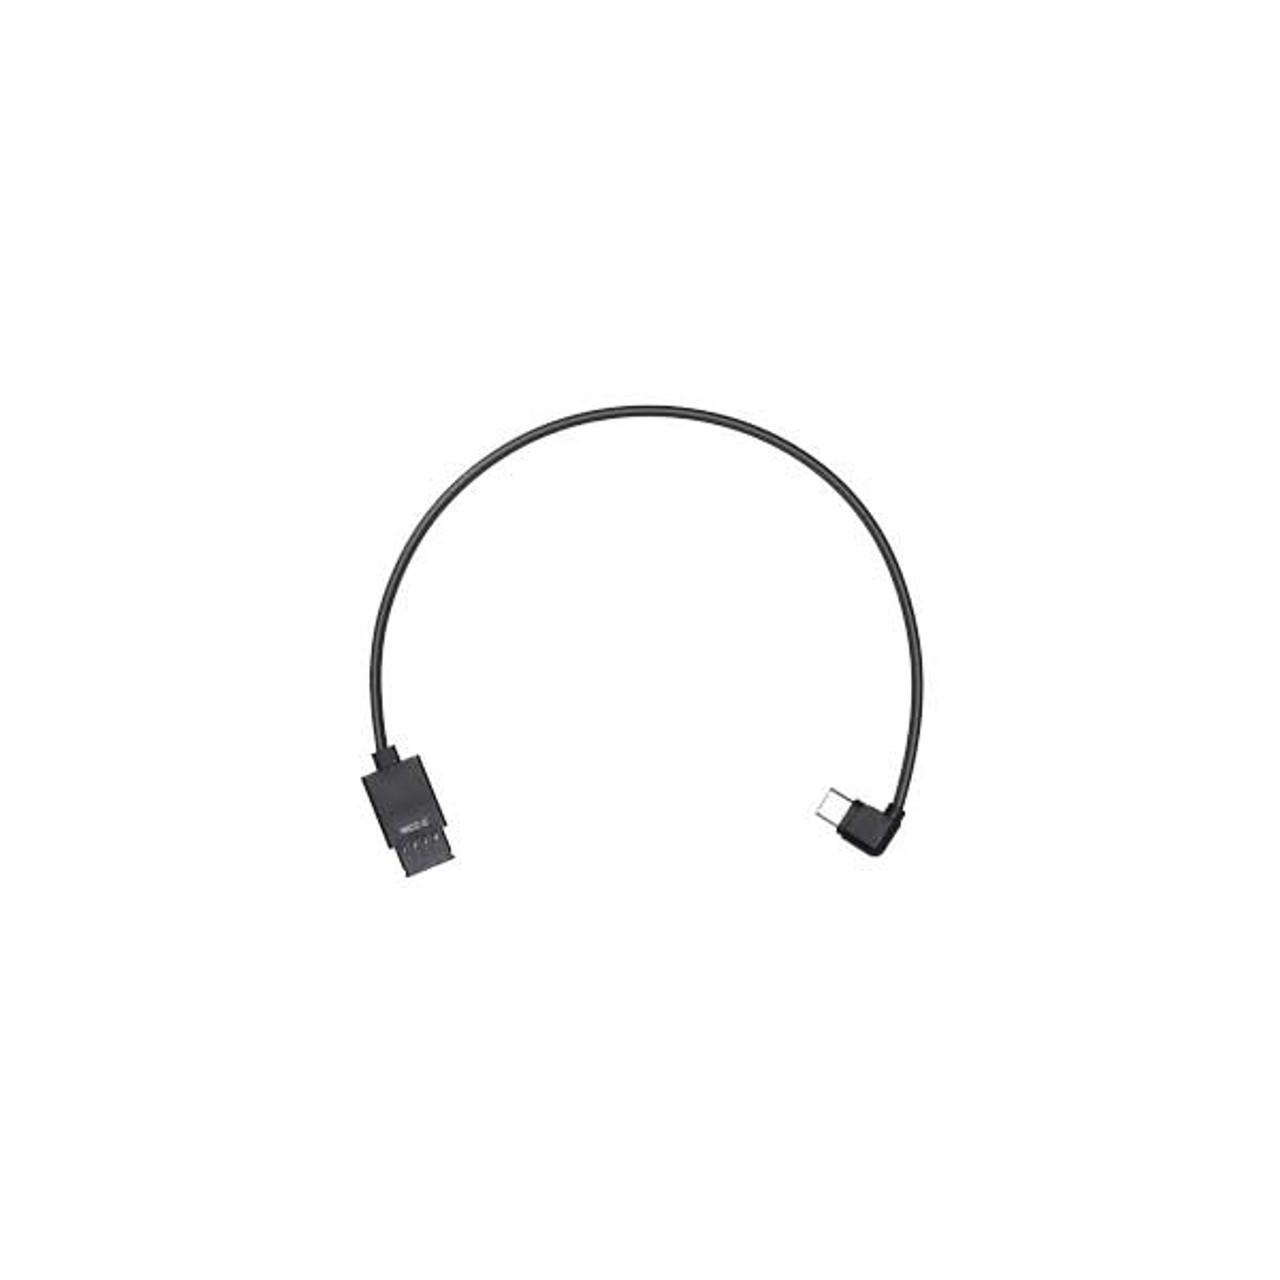 DJI Ronin-S Multi-Camera Control Cable (Type-C)